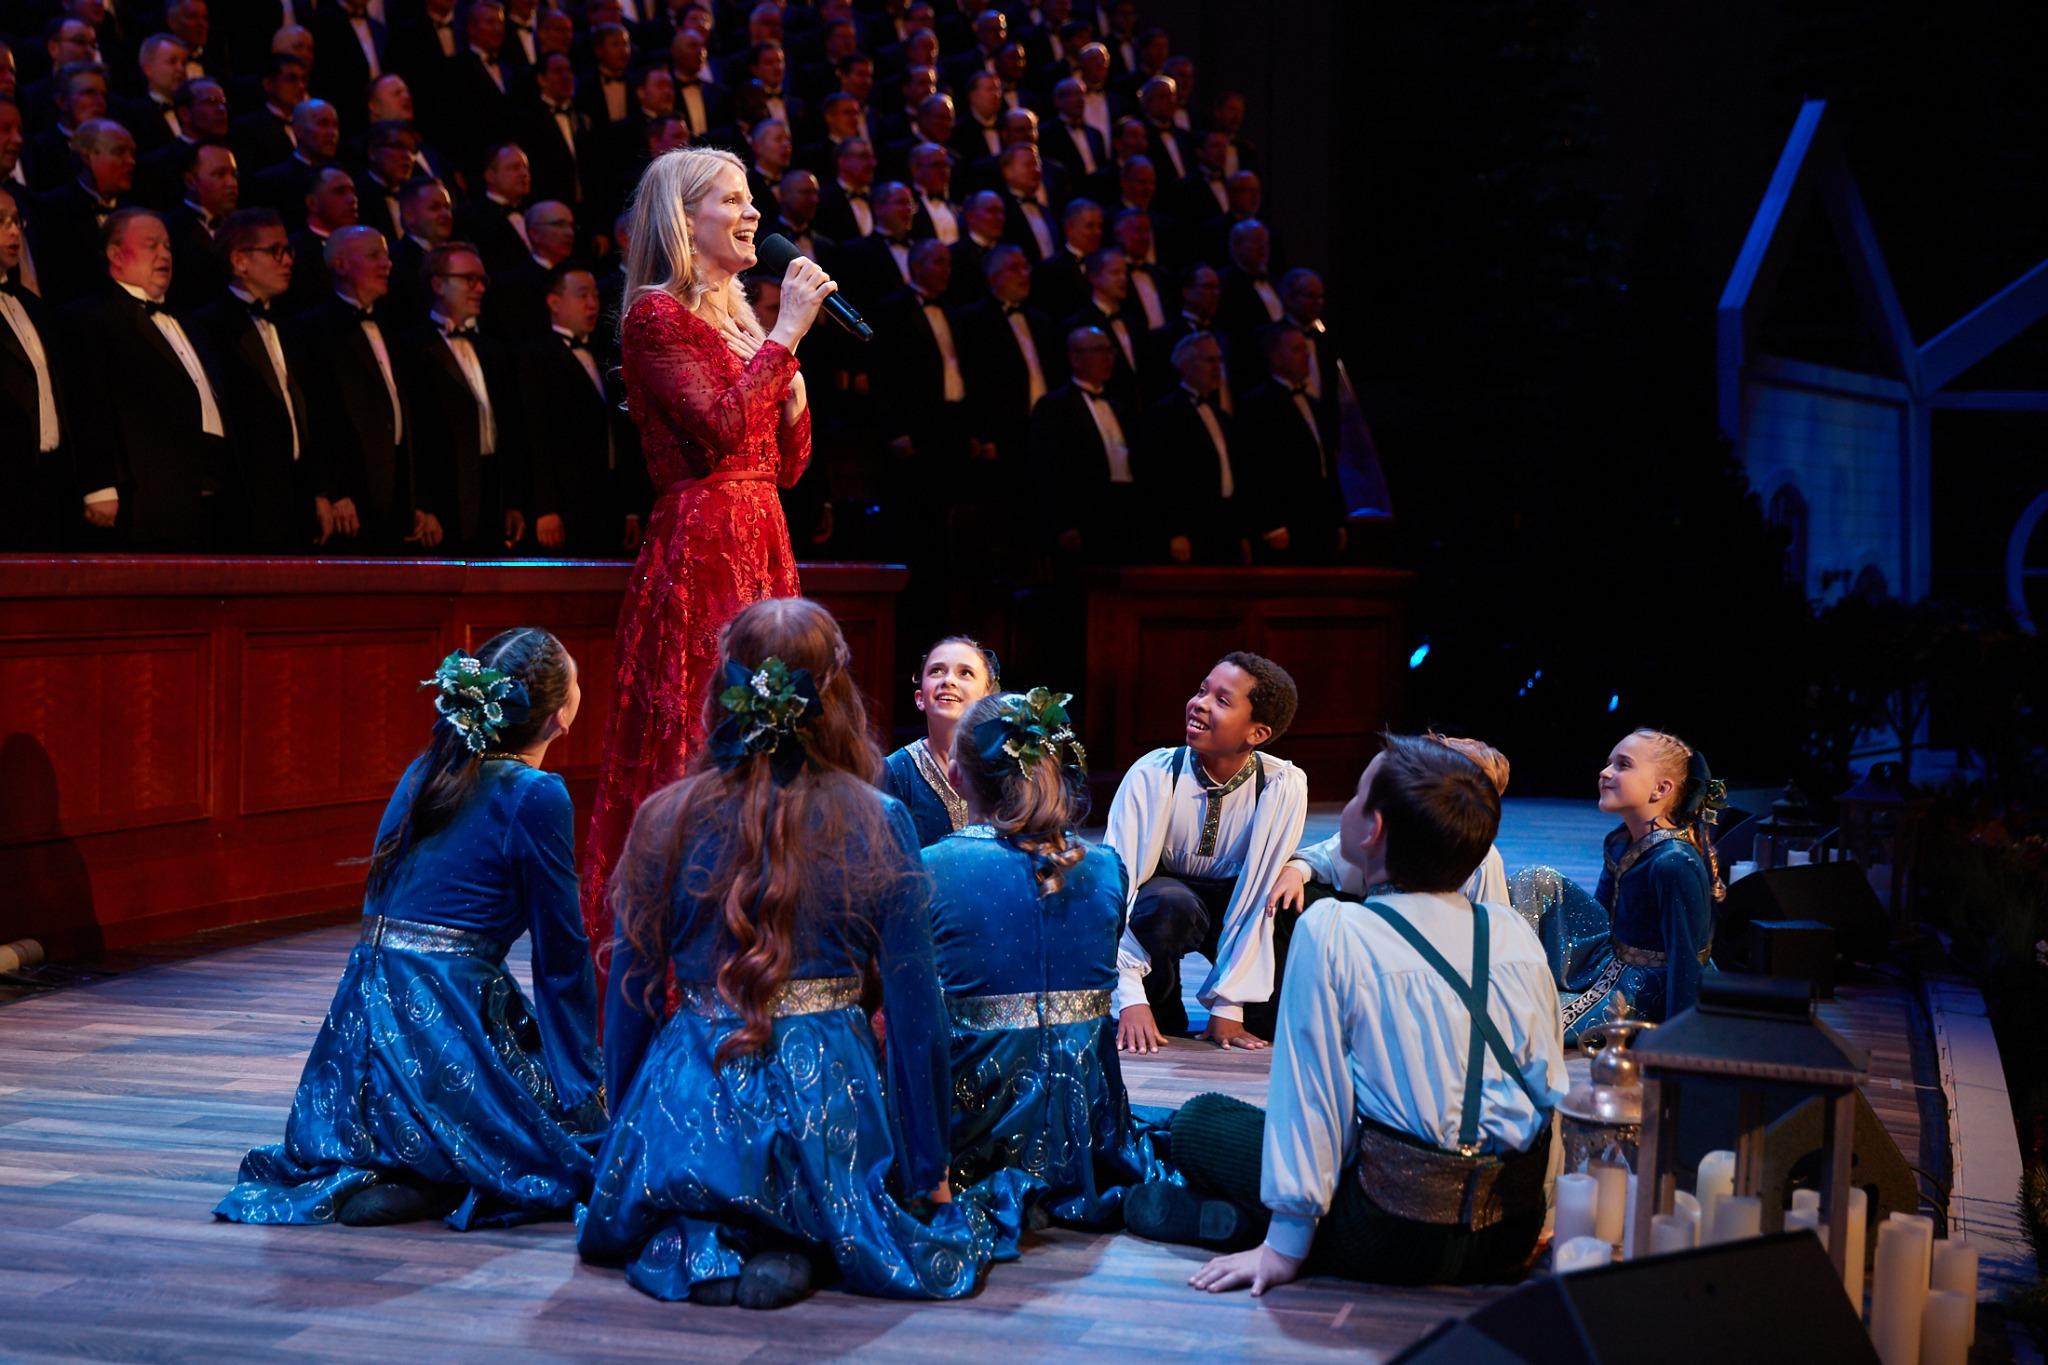 2021 Mormon Tabernacle Choir Christmas Concert Tabernacle Choir S Christmas Concert Canceled Because Of The Coronavirus